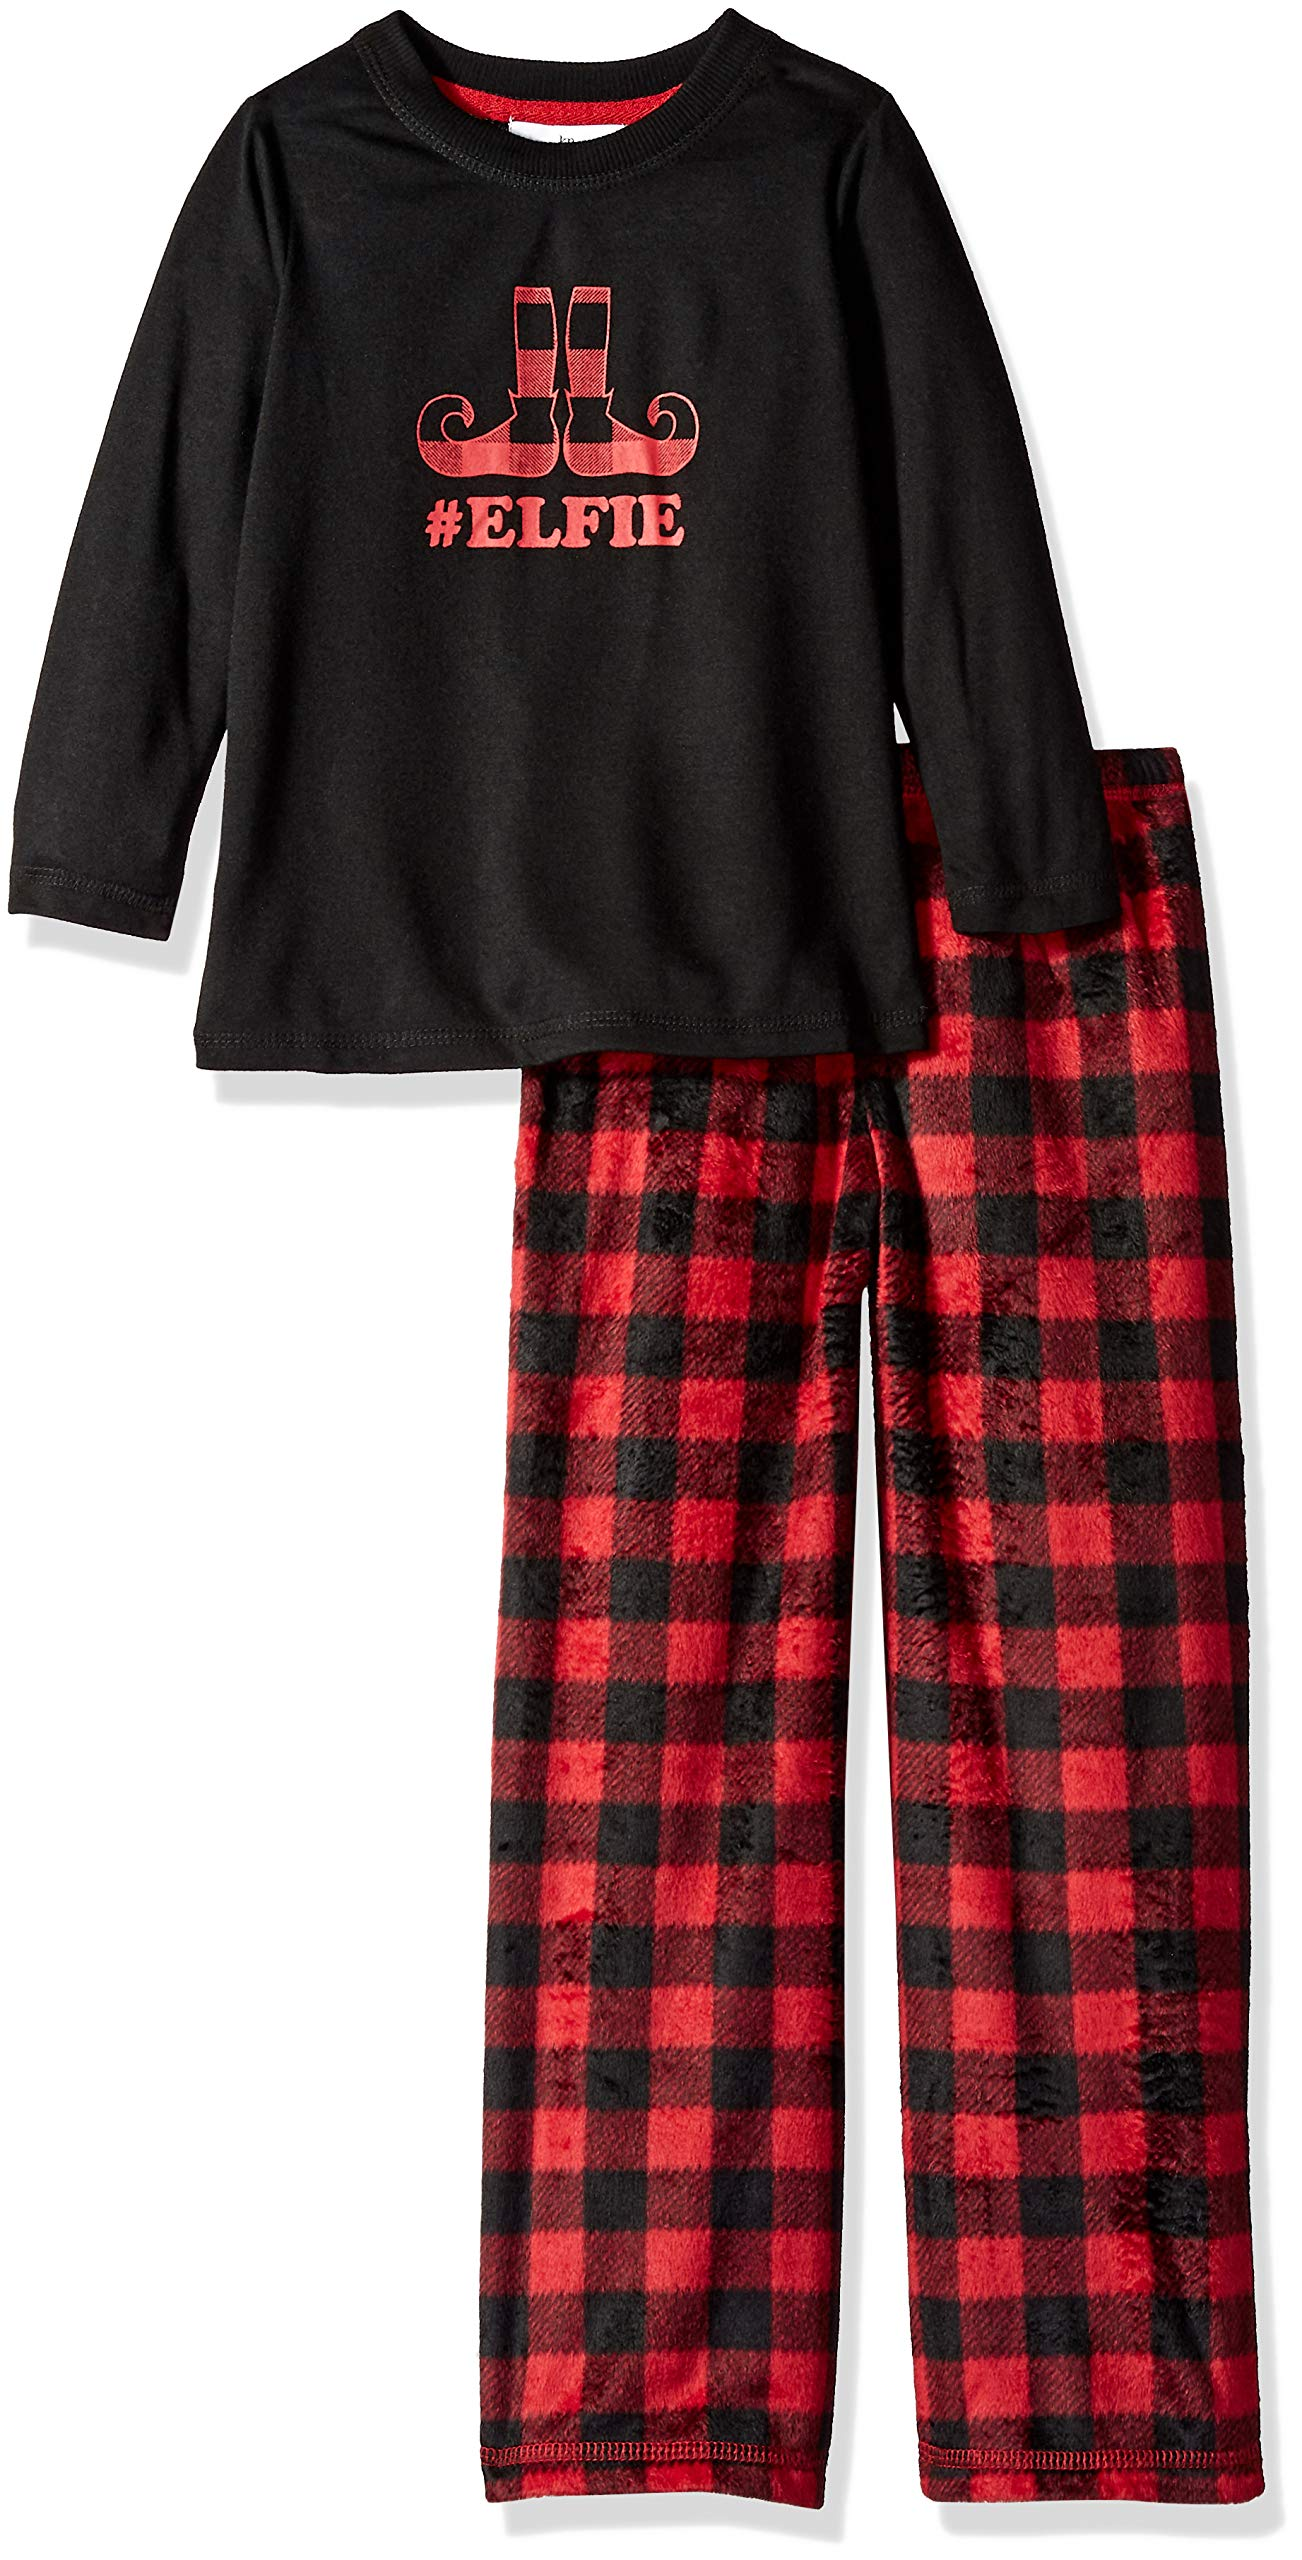 Karen Neuburger Girls' Little Family Matching Christmas Holiday Pajama Sets PJ, Buffalo Plaid red Cherry/Black Combo, Kid M by Karen Neuburger (Image #2)